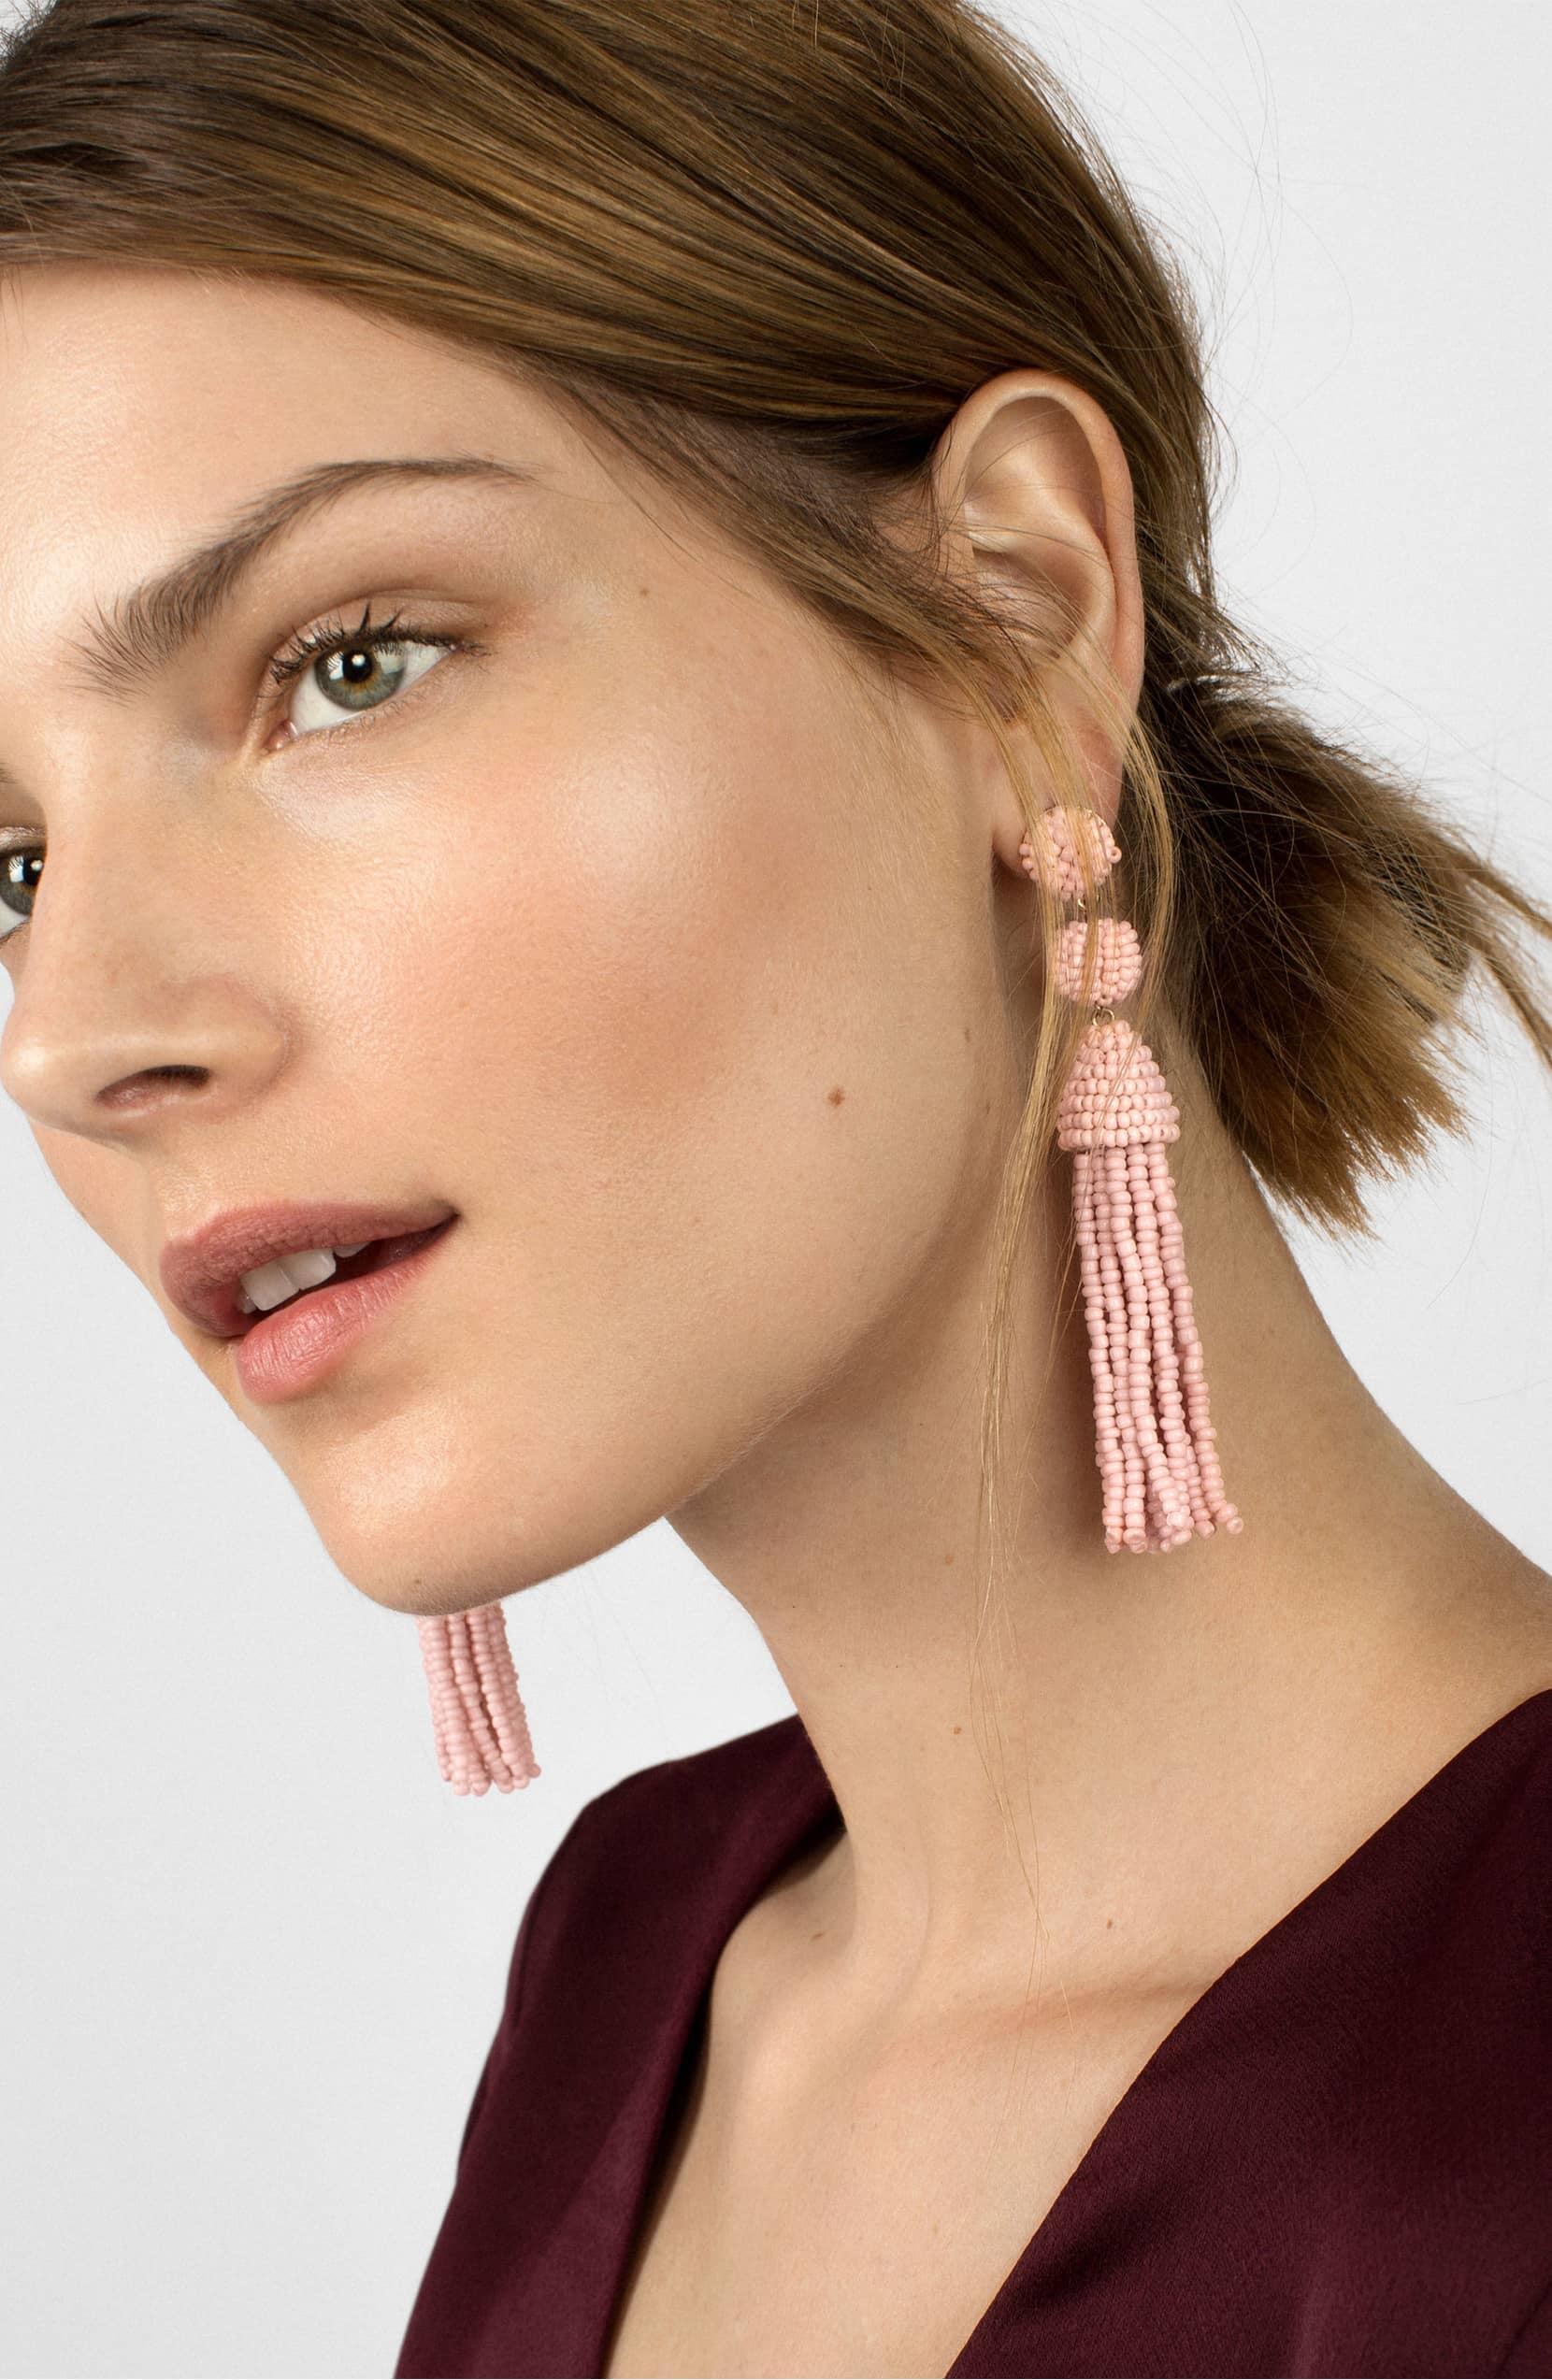 4aef1c92b BaubleBar Granita Beaded Tassel Earrings | The One Accessory That ...